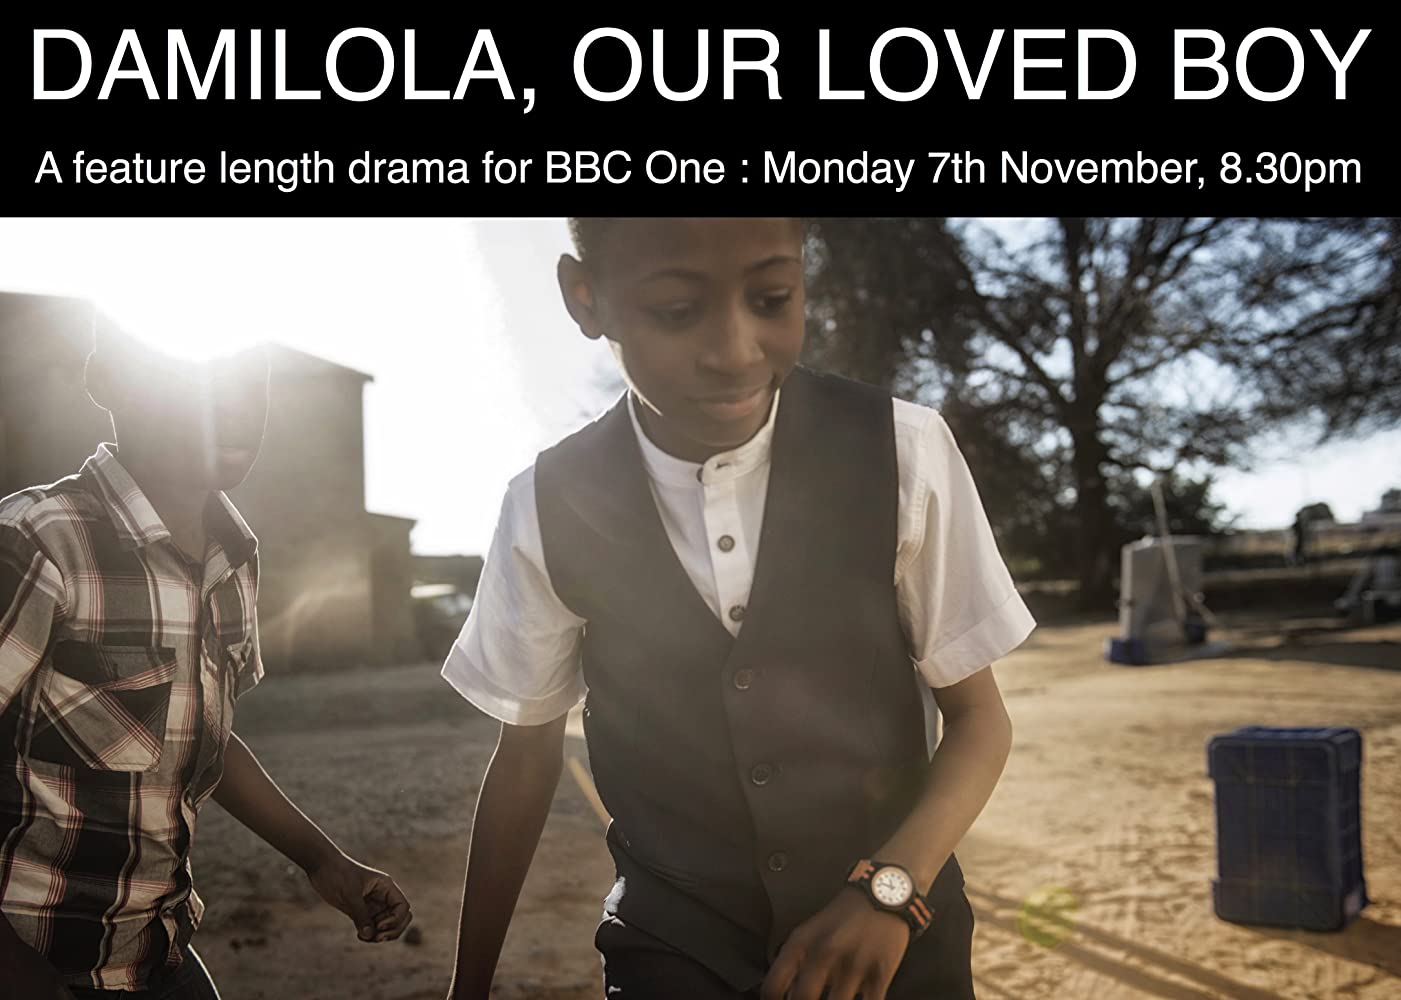 Damilola, Our Loved Boy